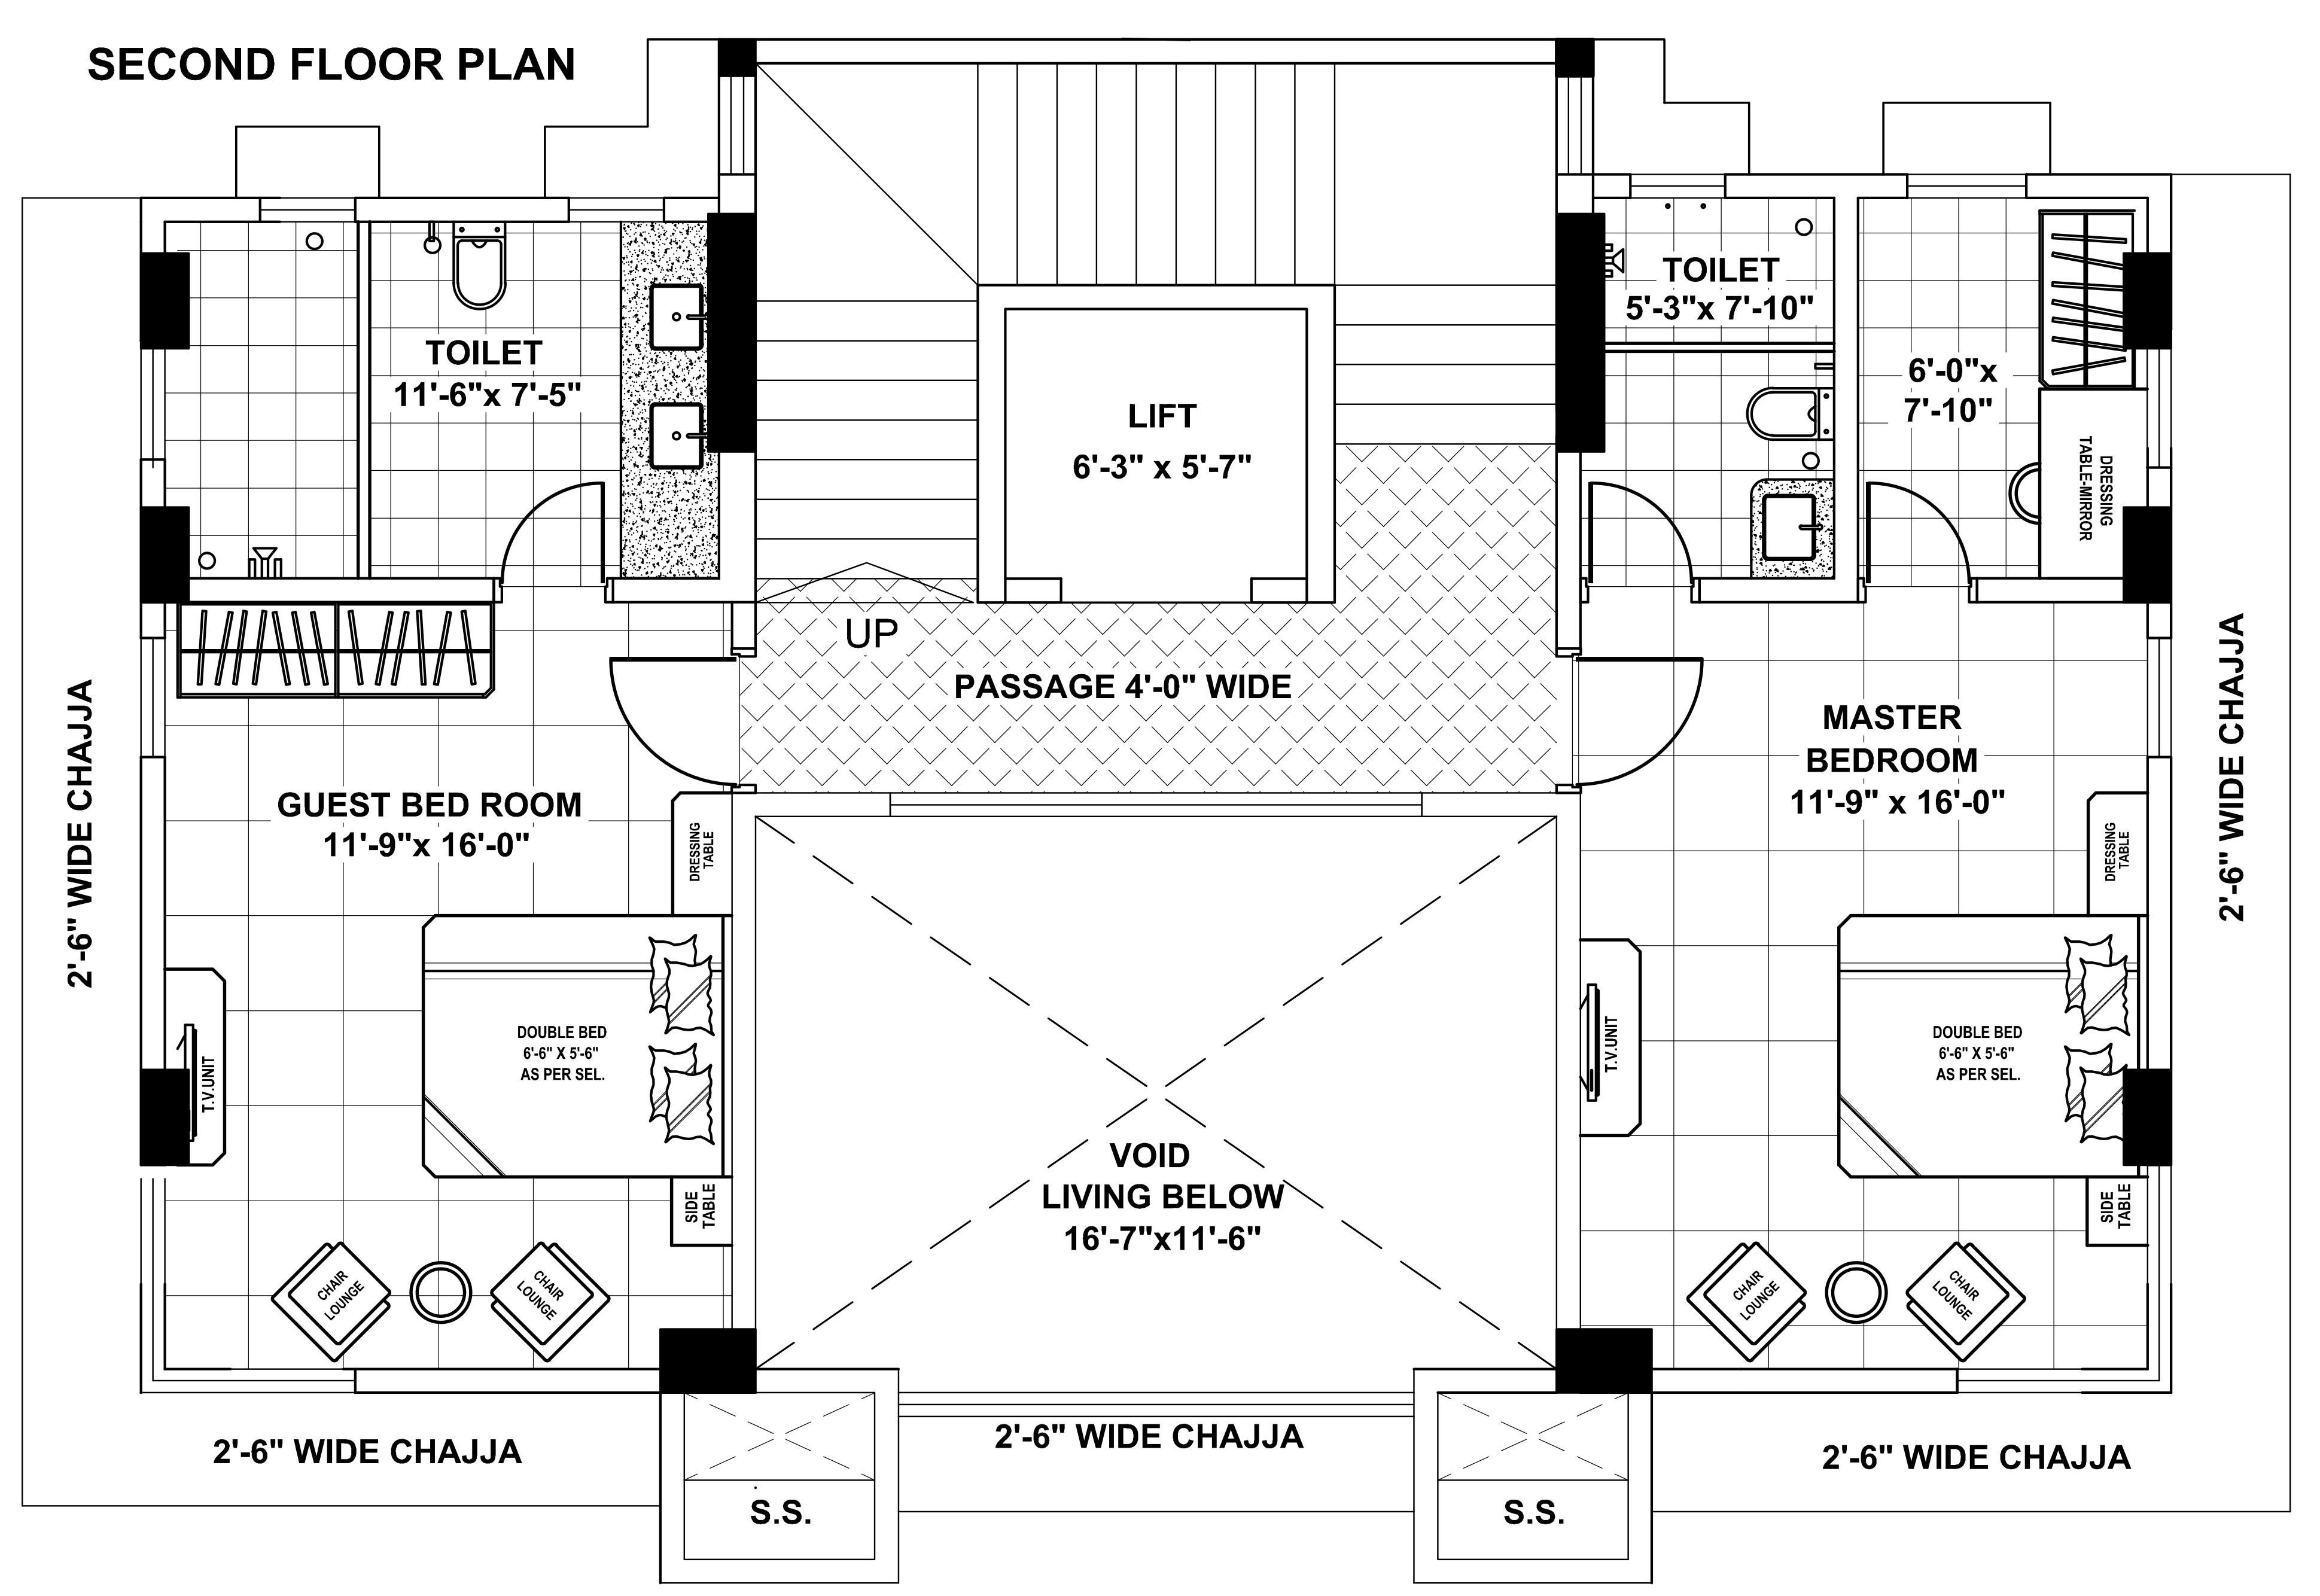 Maison De Reve Plan geopreneur maison de reve in kandivali west, mumbai - price